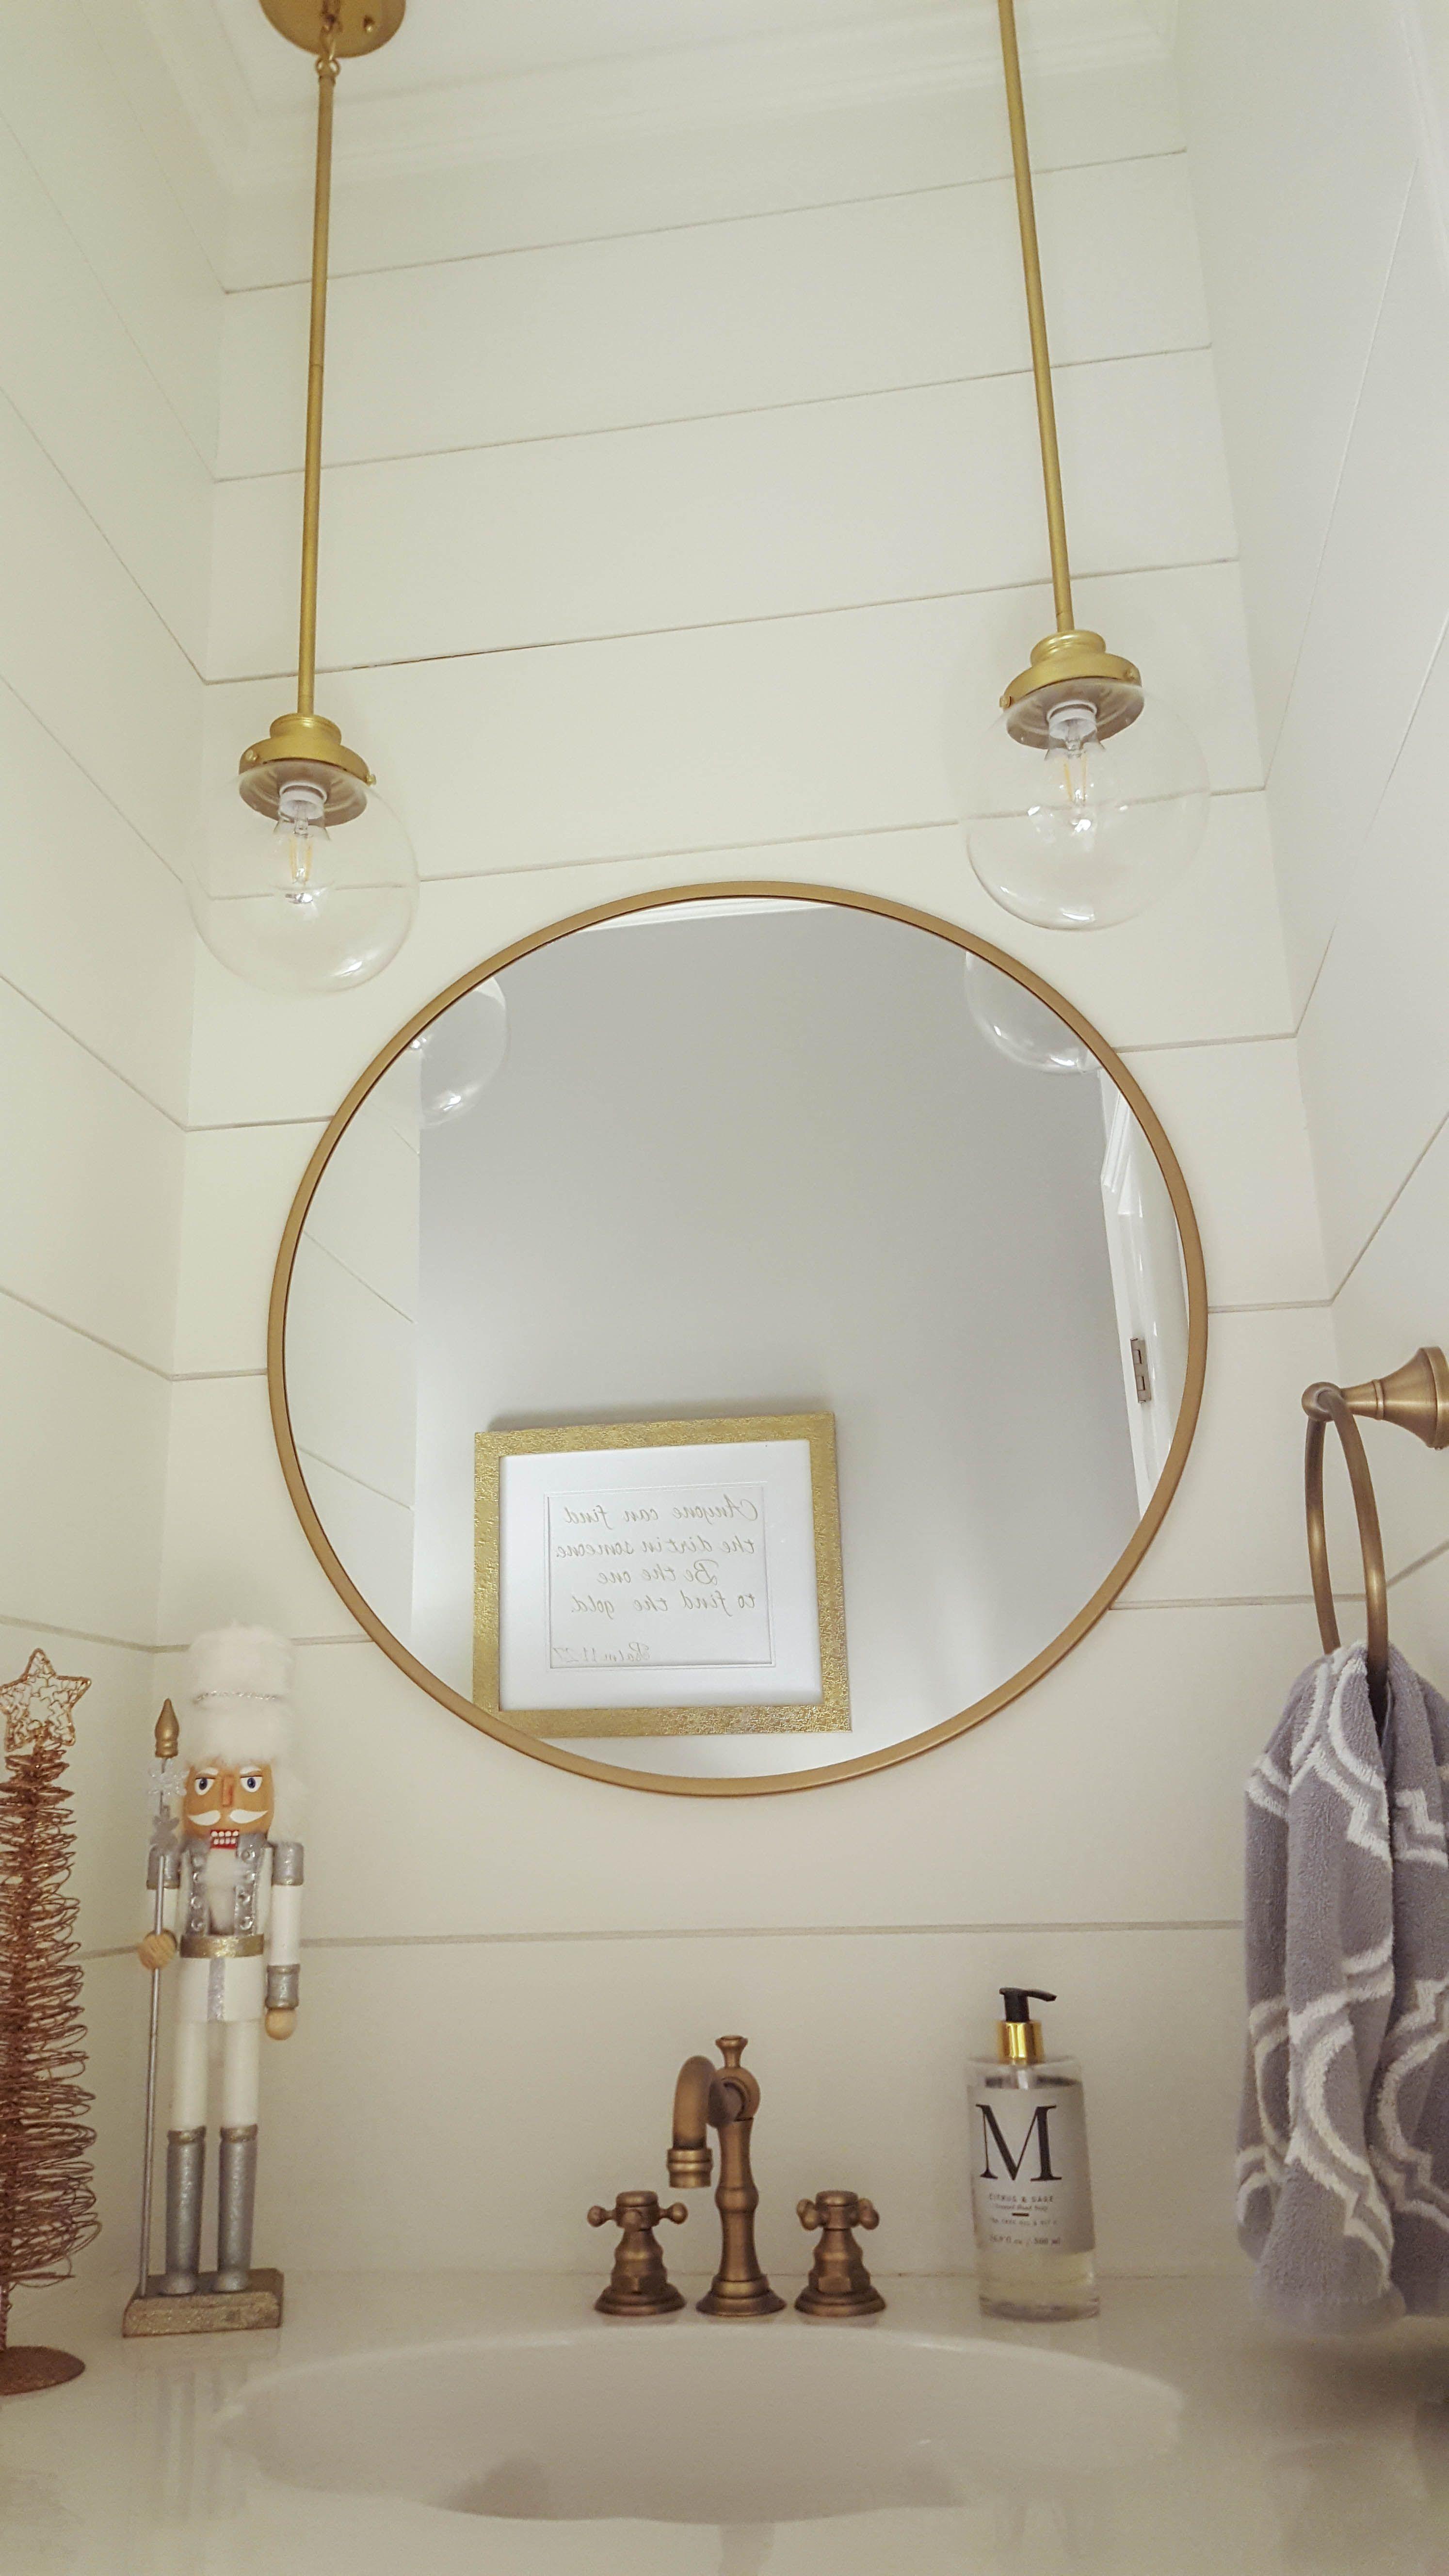 Festive White Gold Bathroom Vanity Incorporates Christmas Decor Glass Light Diy Bathroom Design Small Bathroom Remodel Designs Bathroom Inspiration Colors